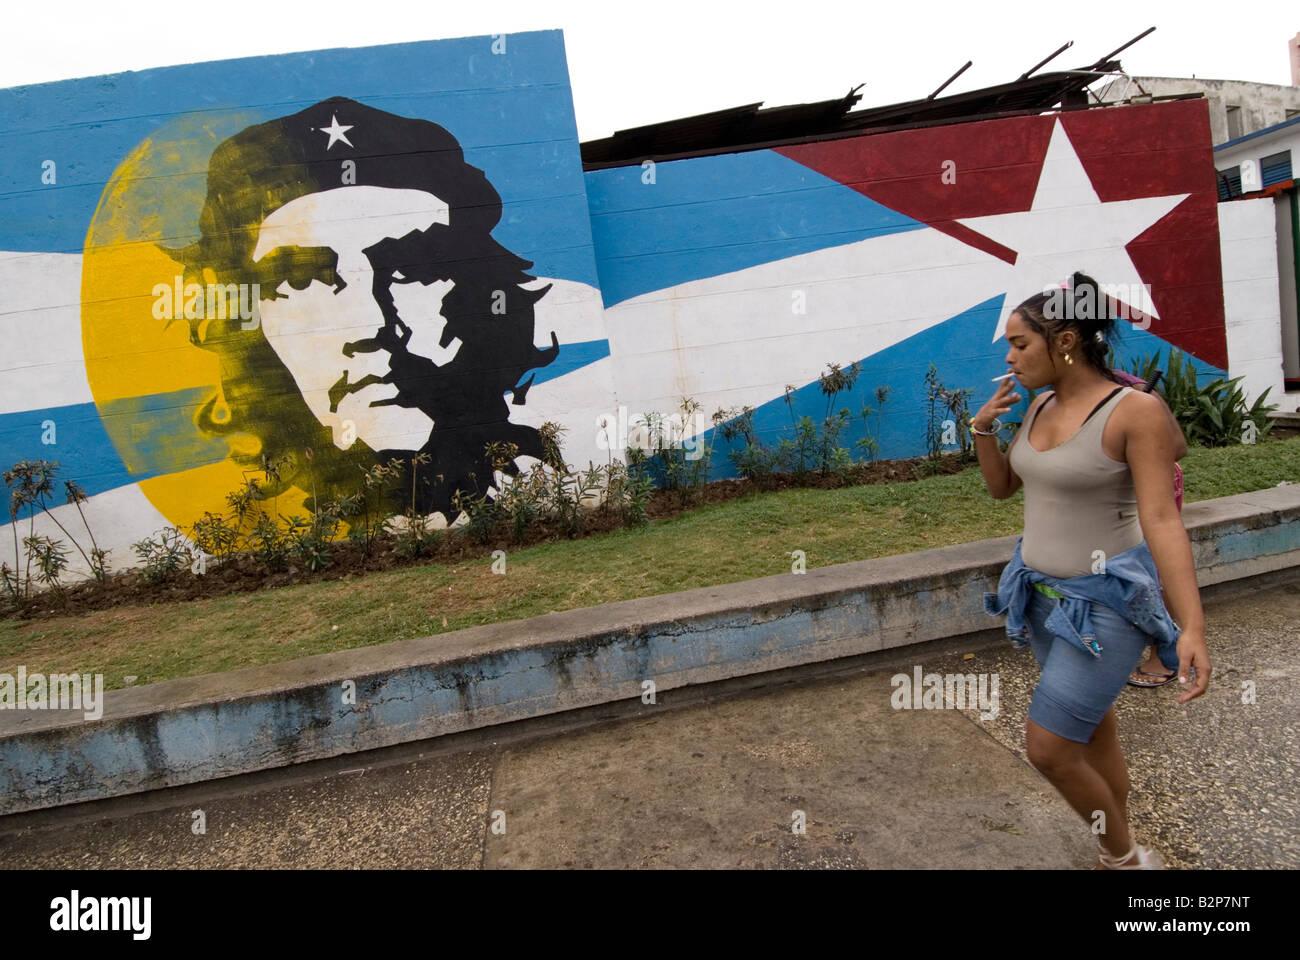 Kubanische Frau vorbeigehen Ernesto Che Guevara Wandbild. Centro. Havanna. Kuba Stockbild